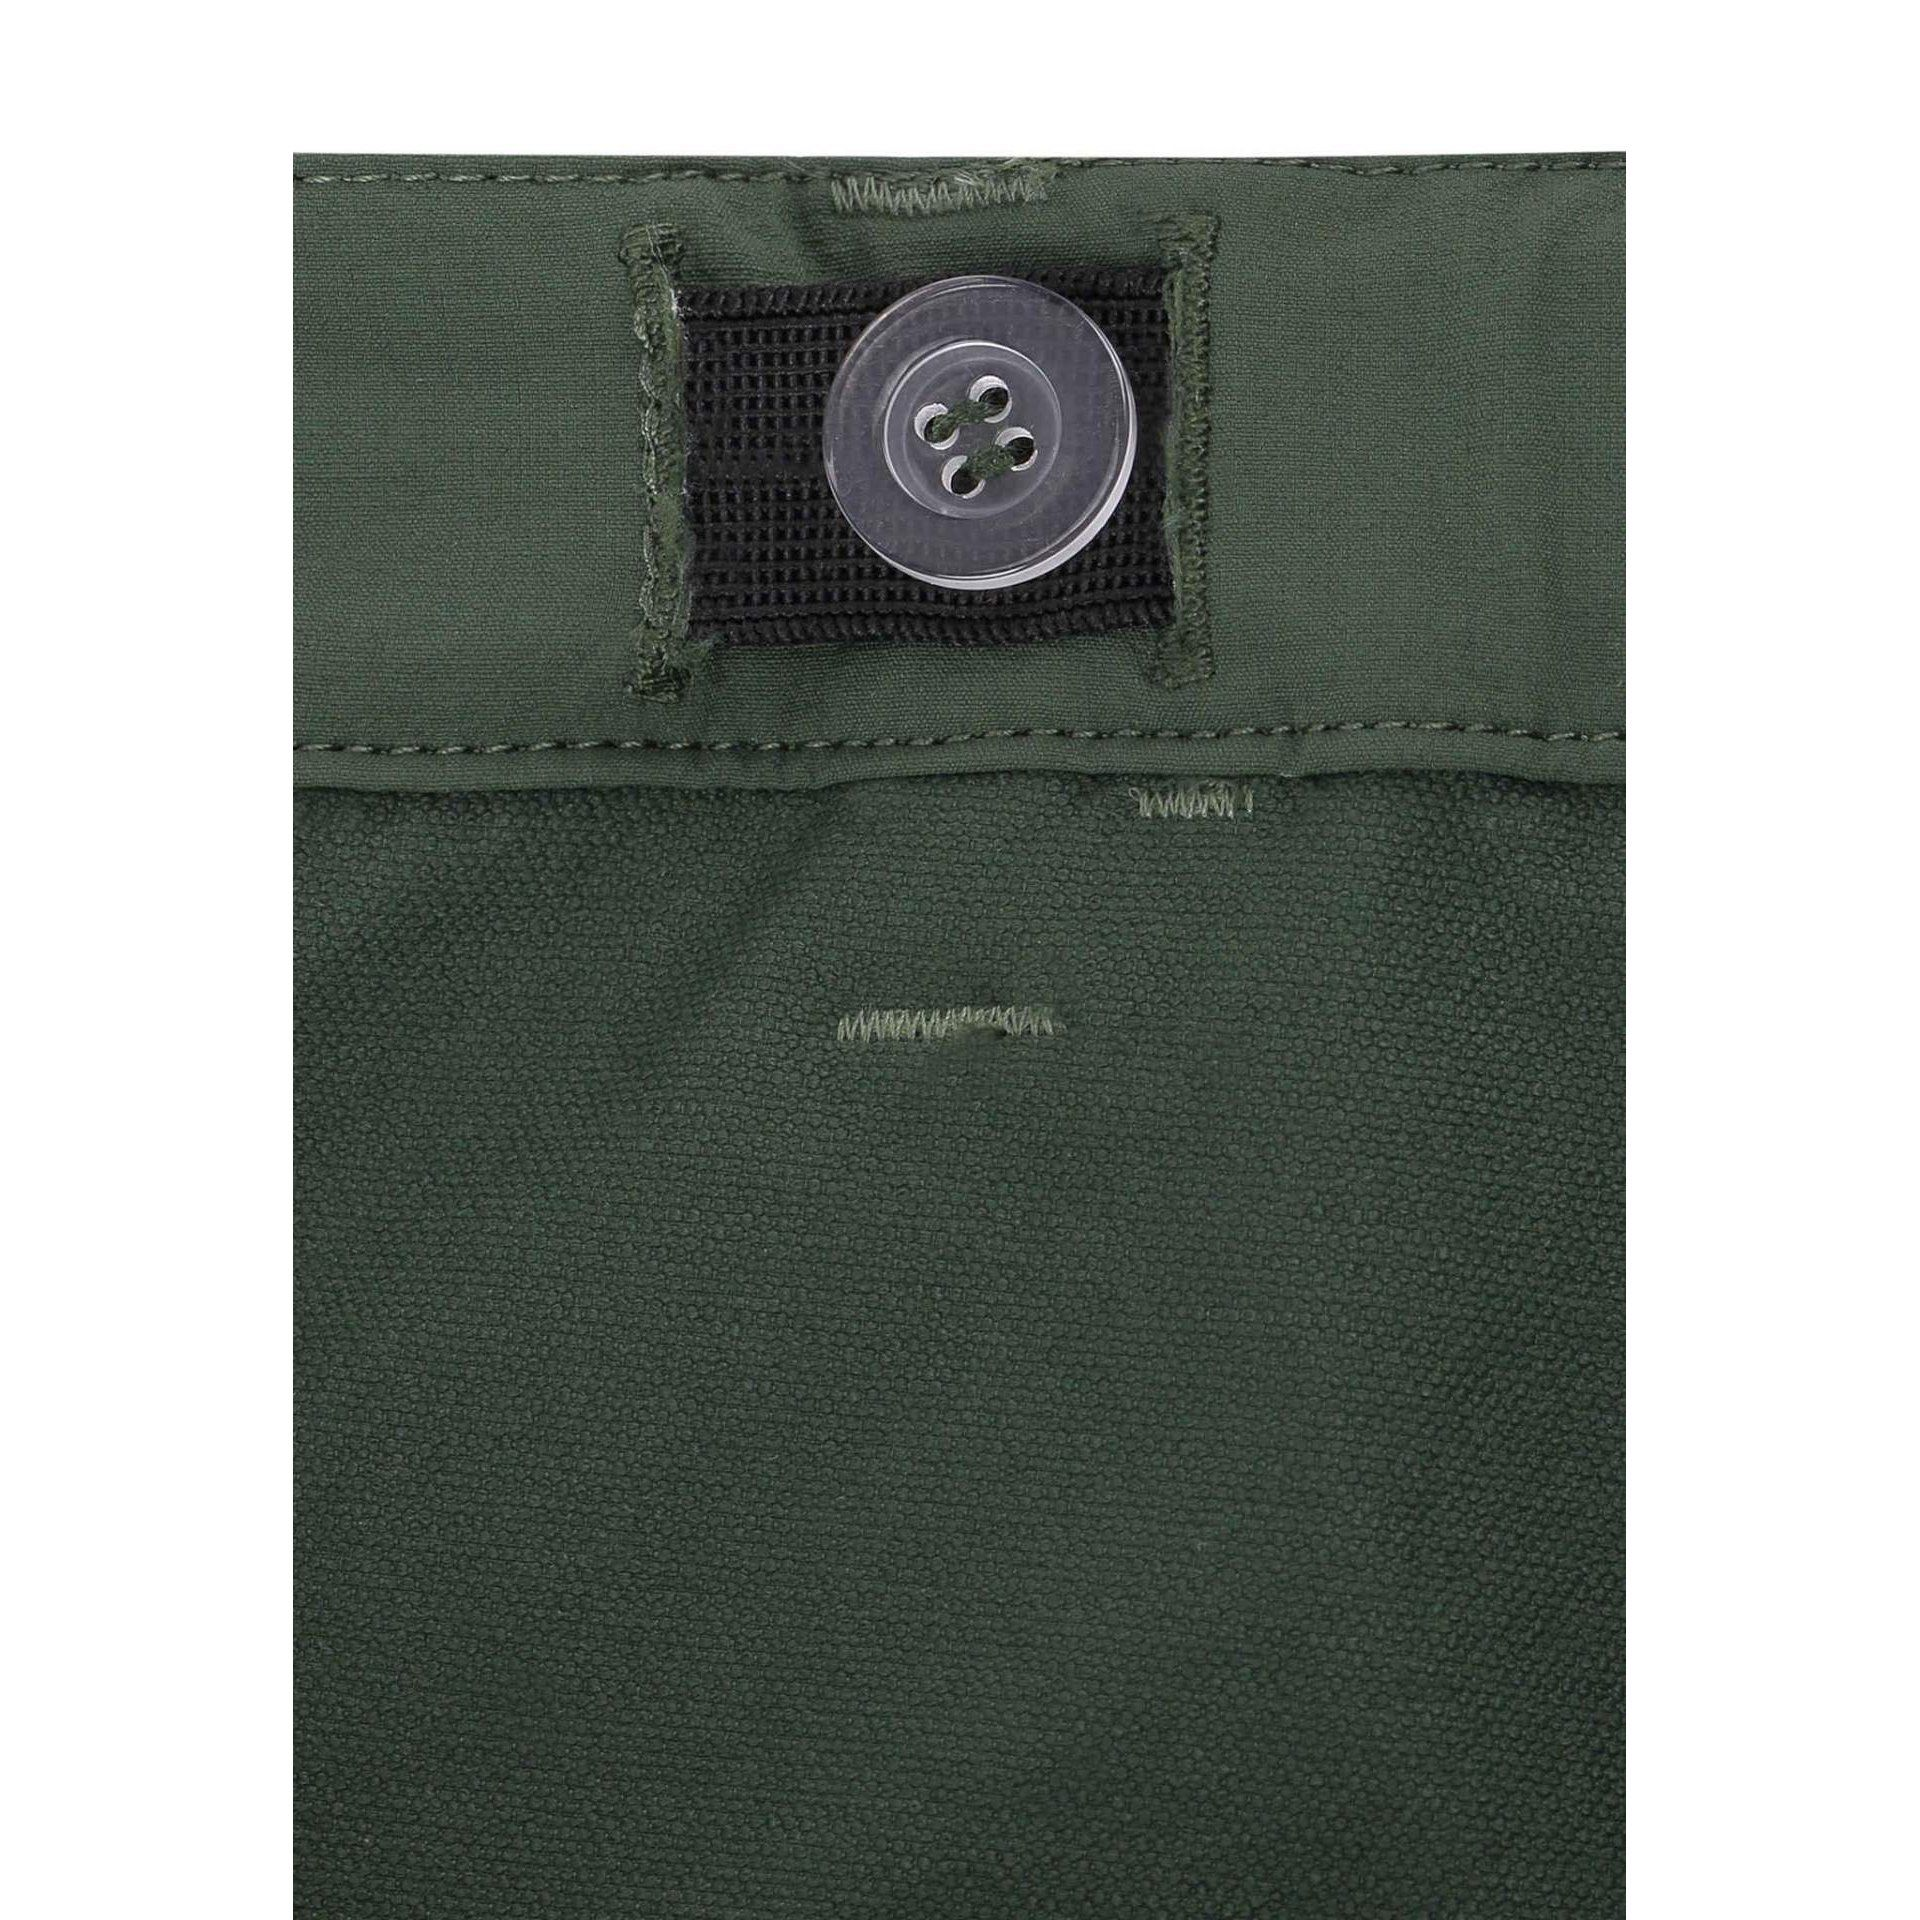 SPODNIE REIMA VIRTAUS 532165B-8940 DARK GREEN DETALE